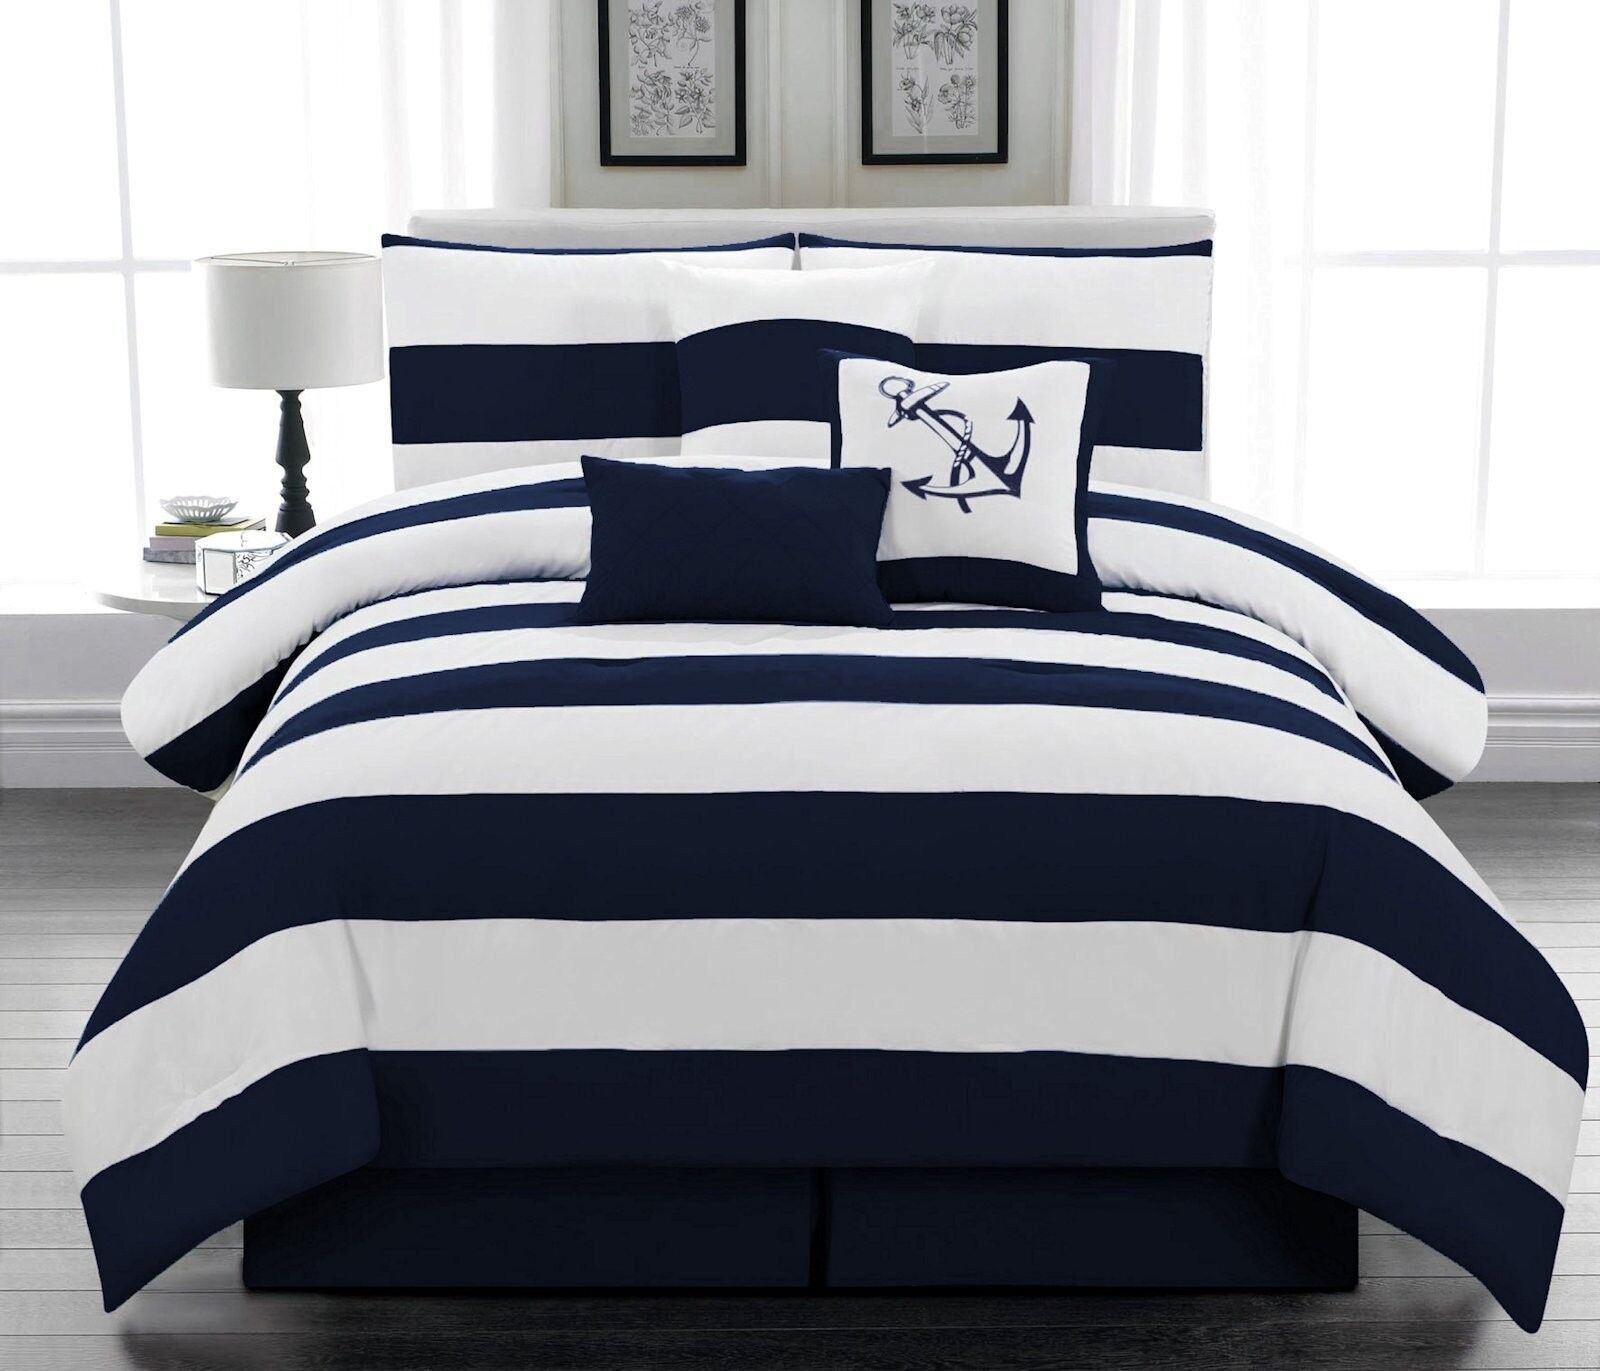 cheap queen size comforter sets - cheap comforter sets full  microfiber nautical comforter set navy bluestriped twin full queen king calking